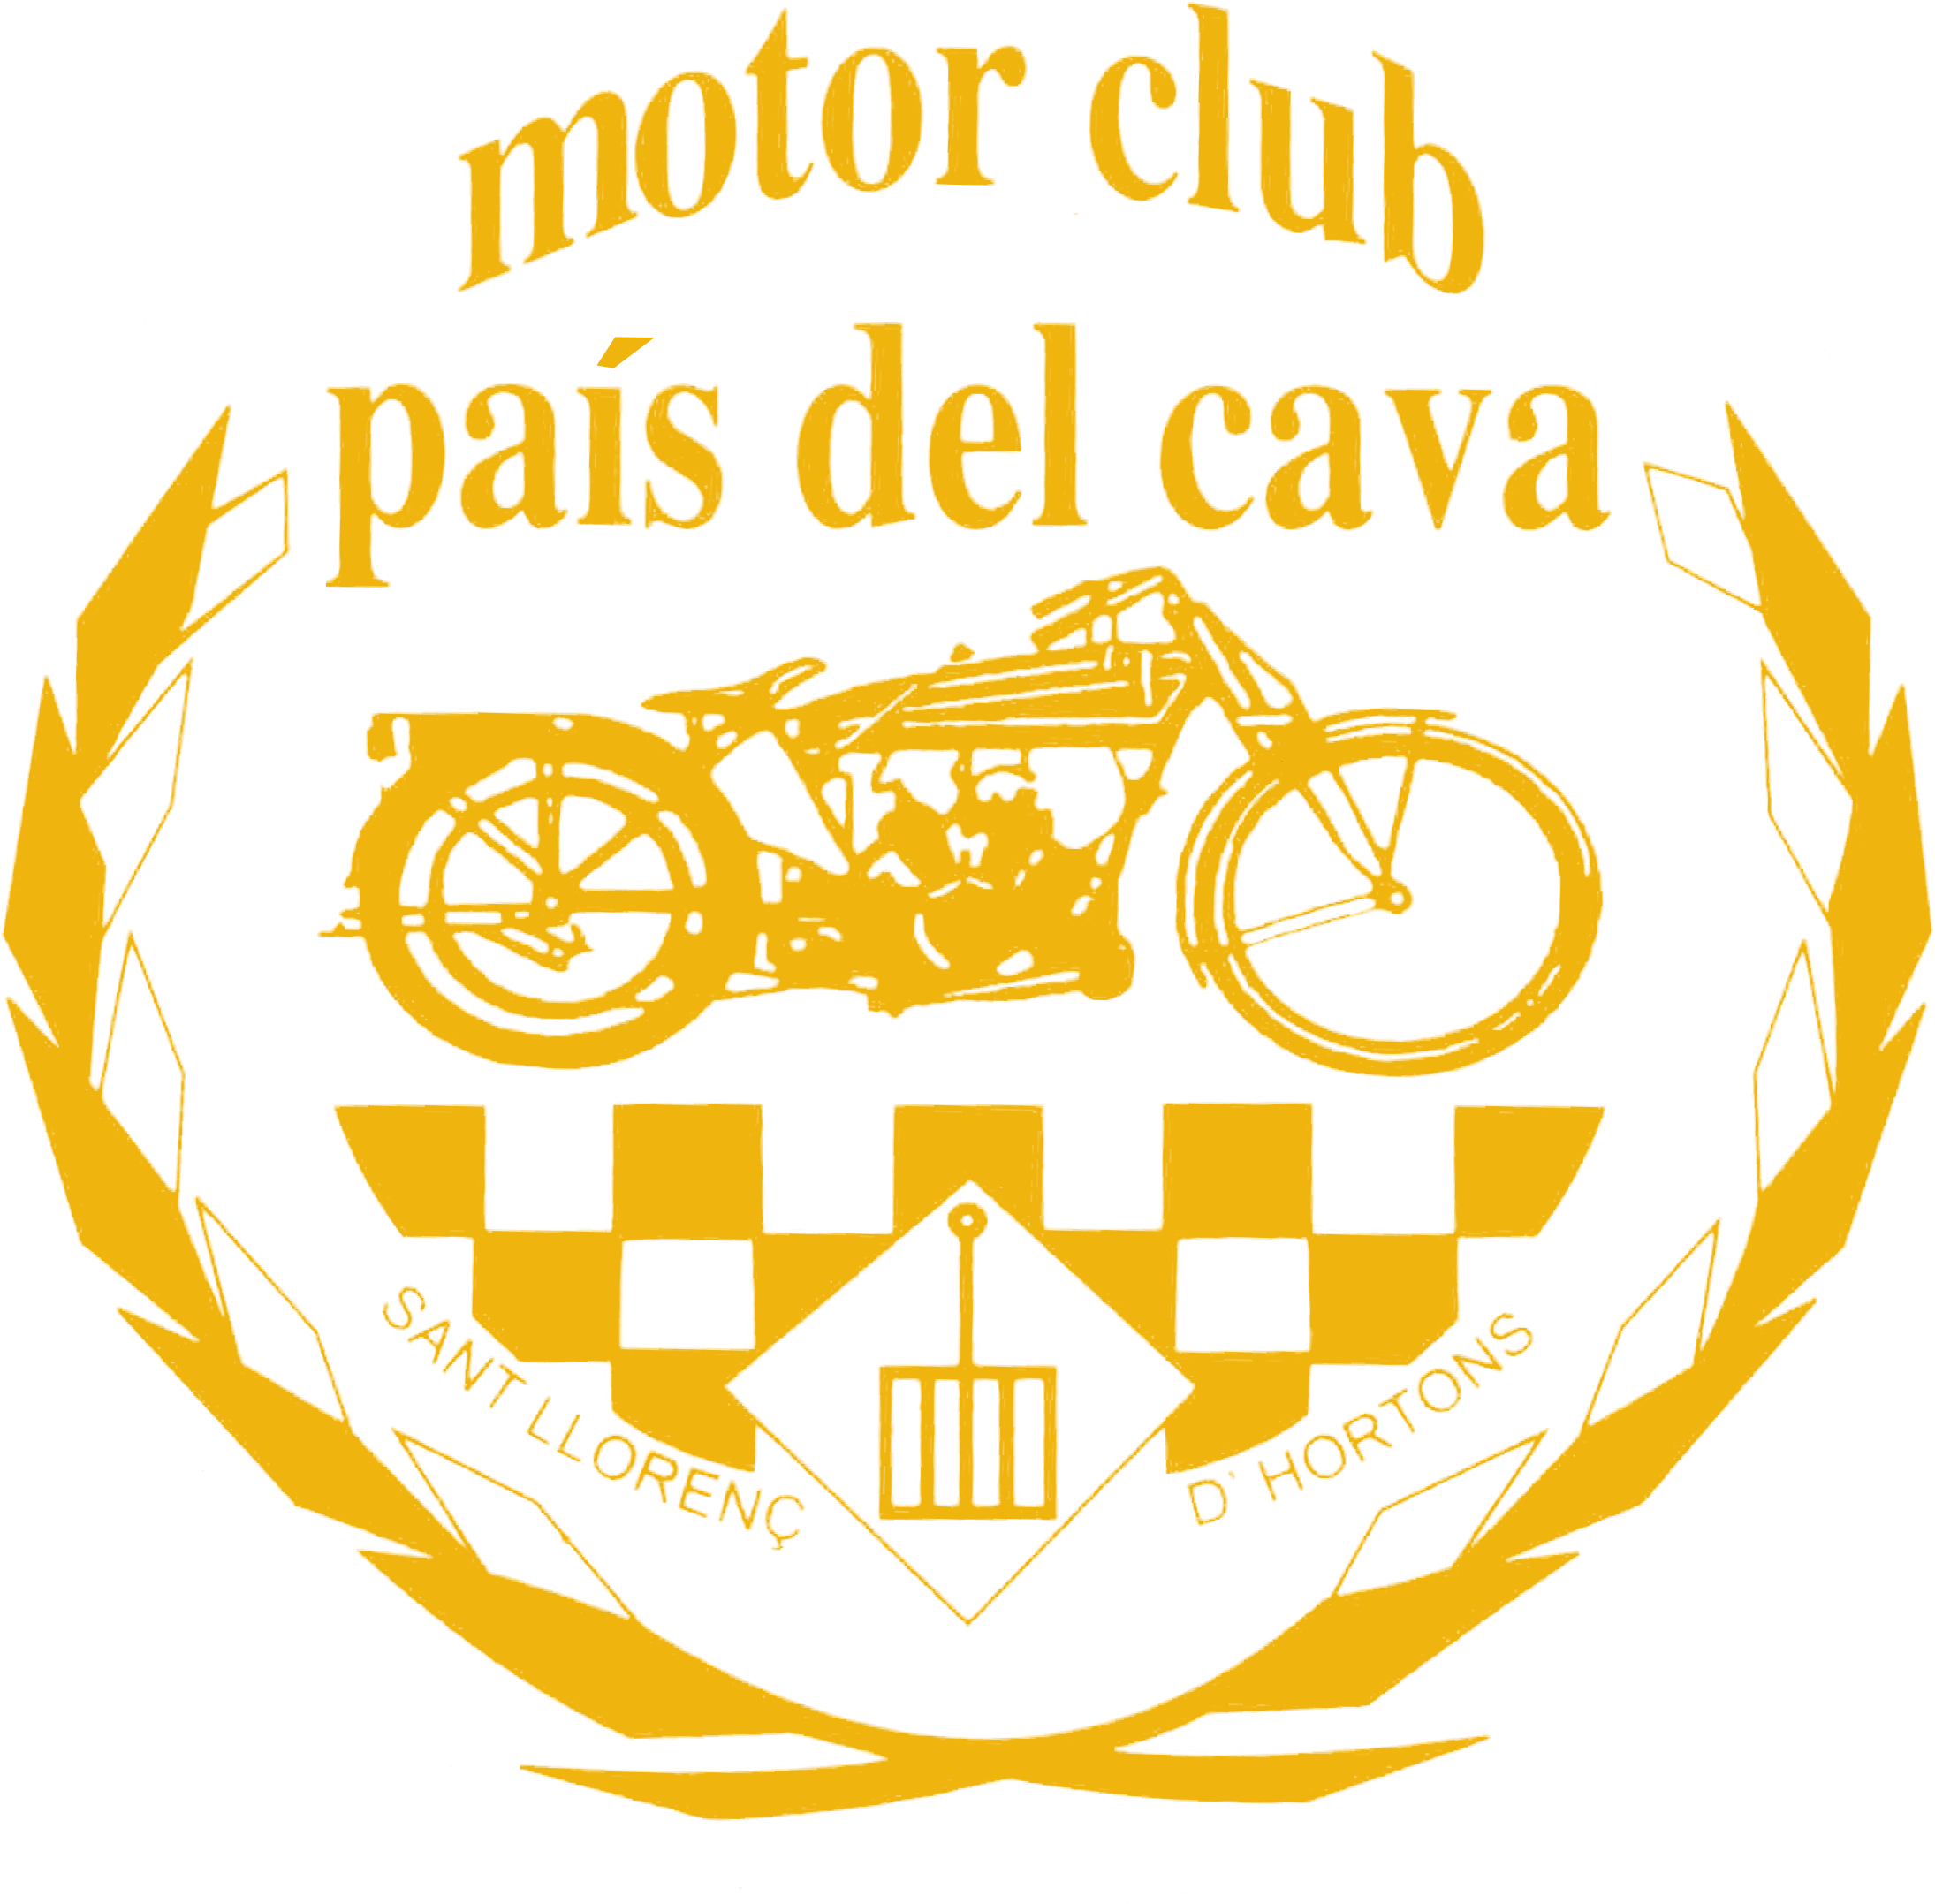 Motor Club País del Cava